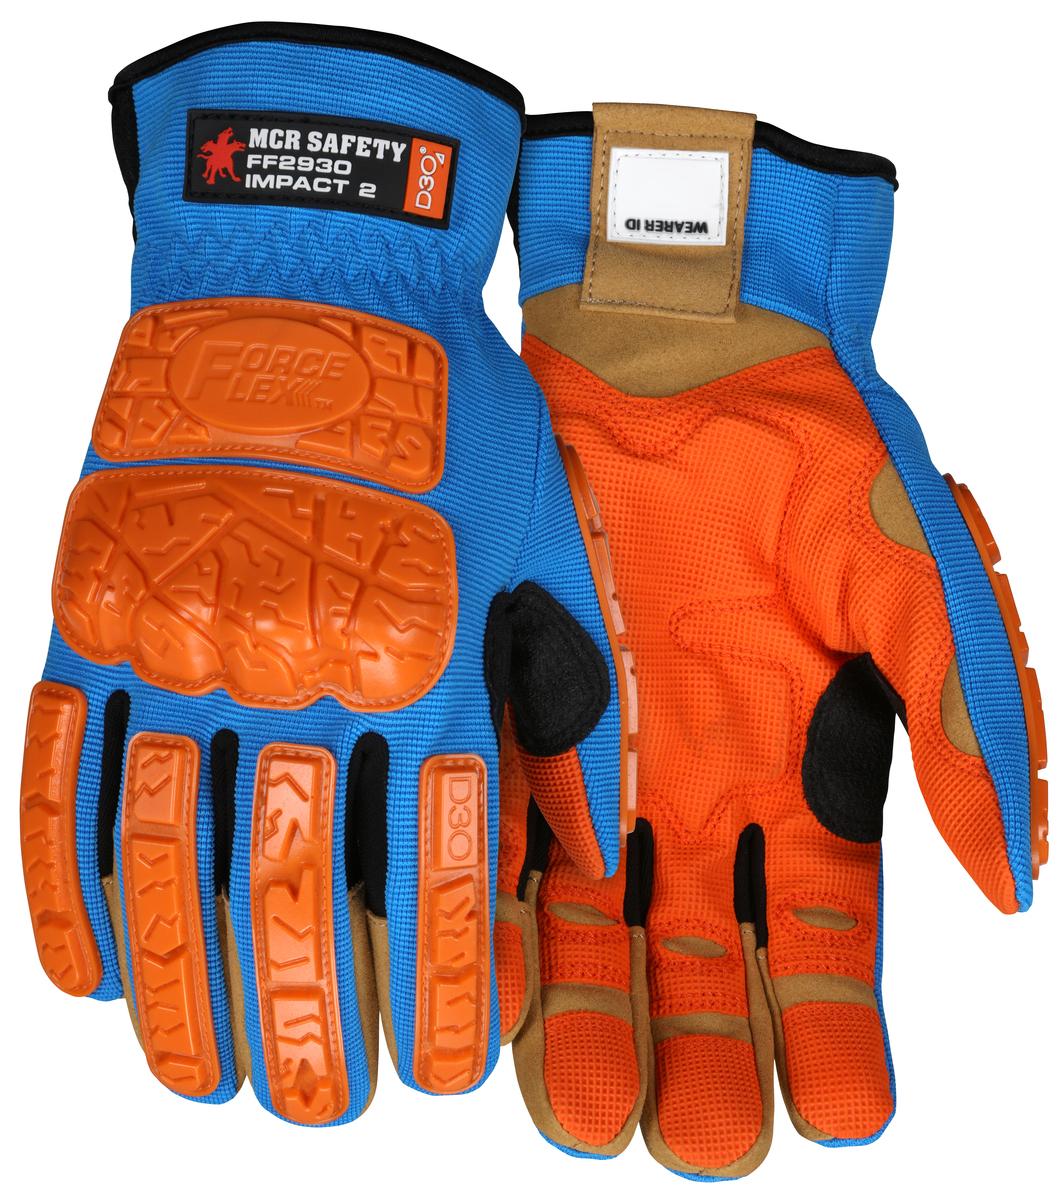 MCR Safety ForceFlex® MaxGrid™ Reinforced Padded Palm Mechanics Gloves